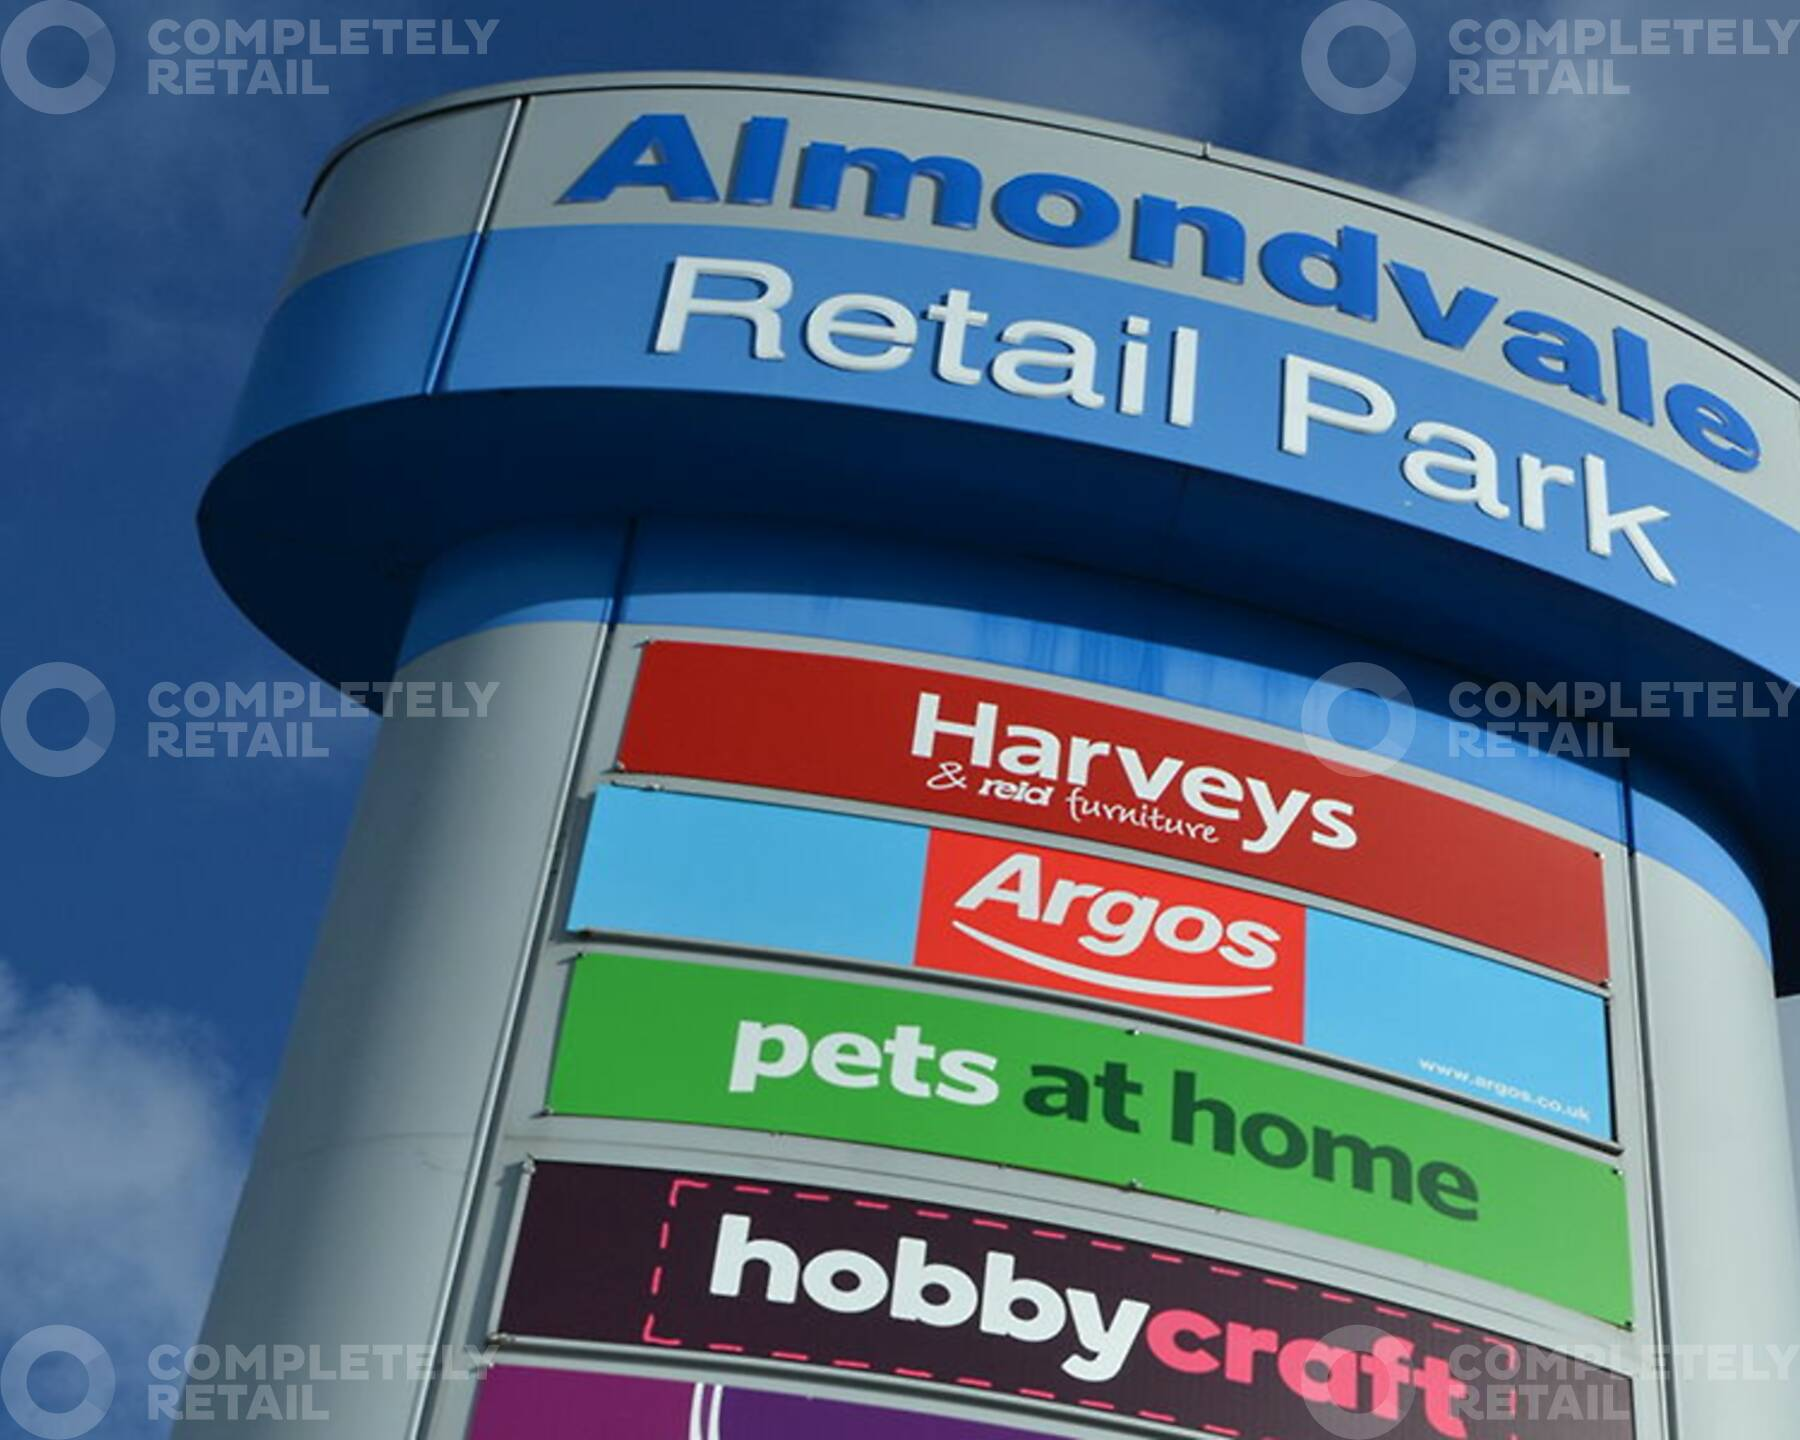 Almondvale Retail Park